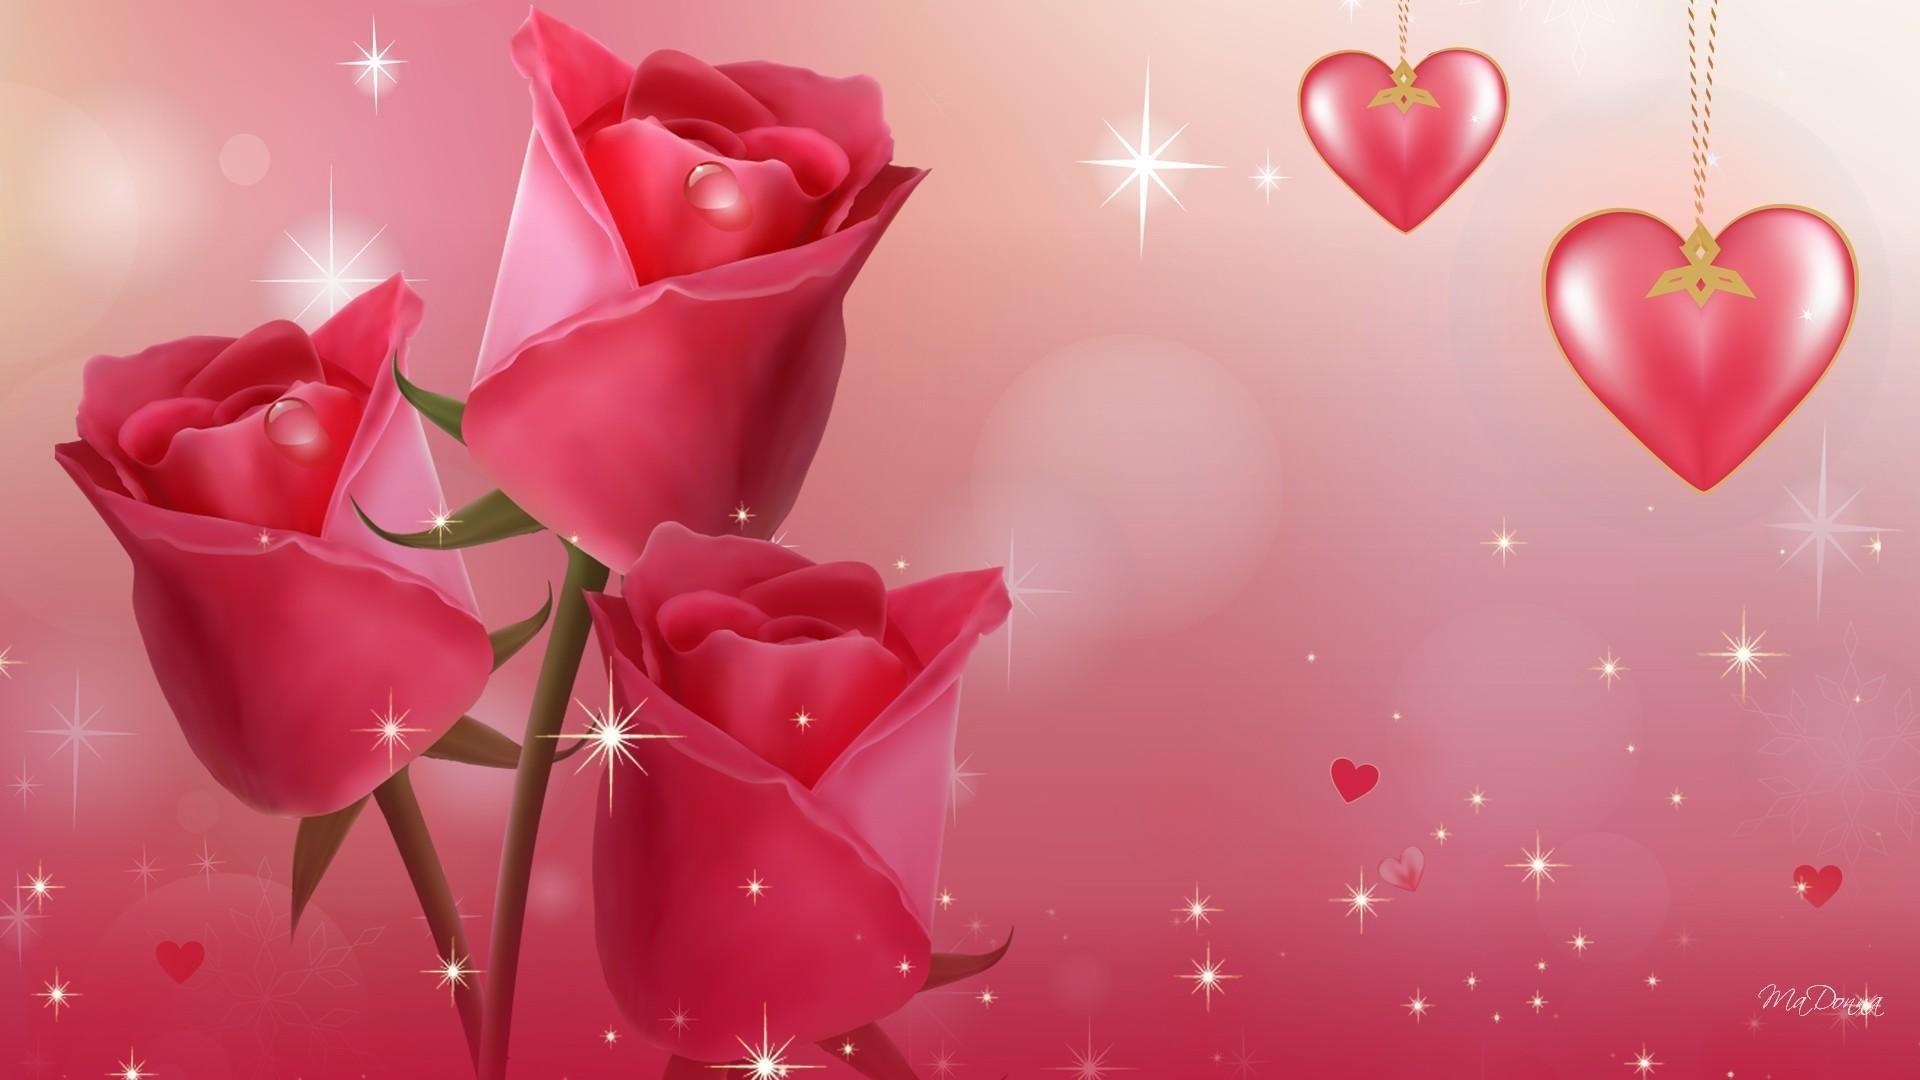 Beautiful rose flowers wallpapers 52 images 1920x1080 worlds top 100 beautiful flowers images wallpaper photos free download izmirmasajfo